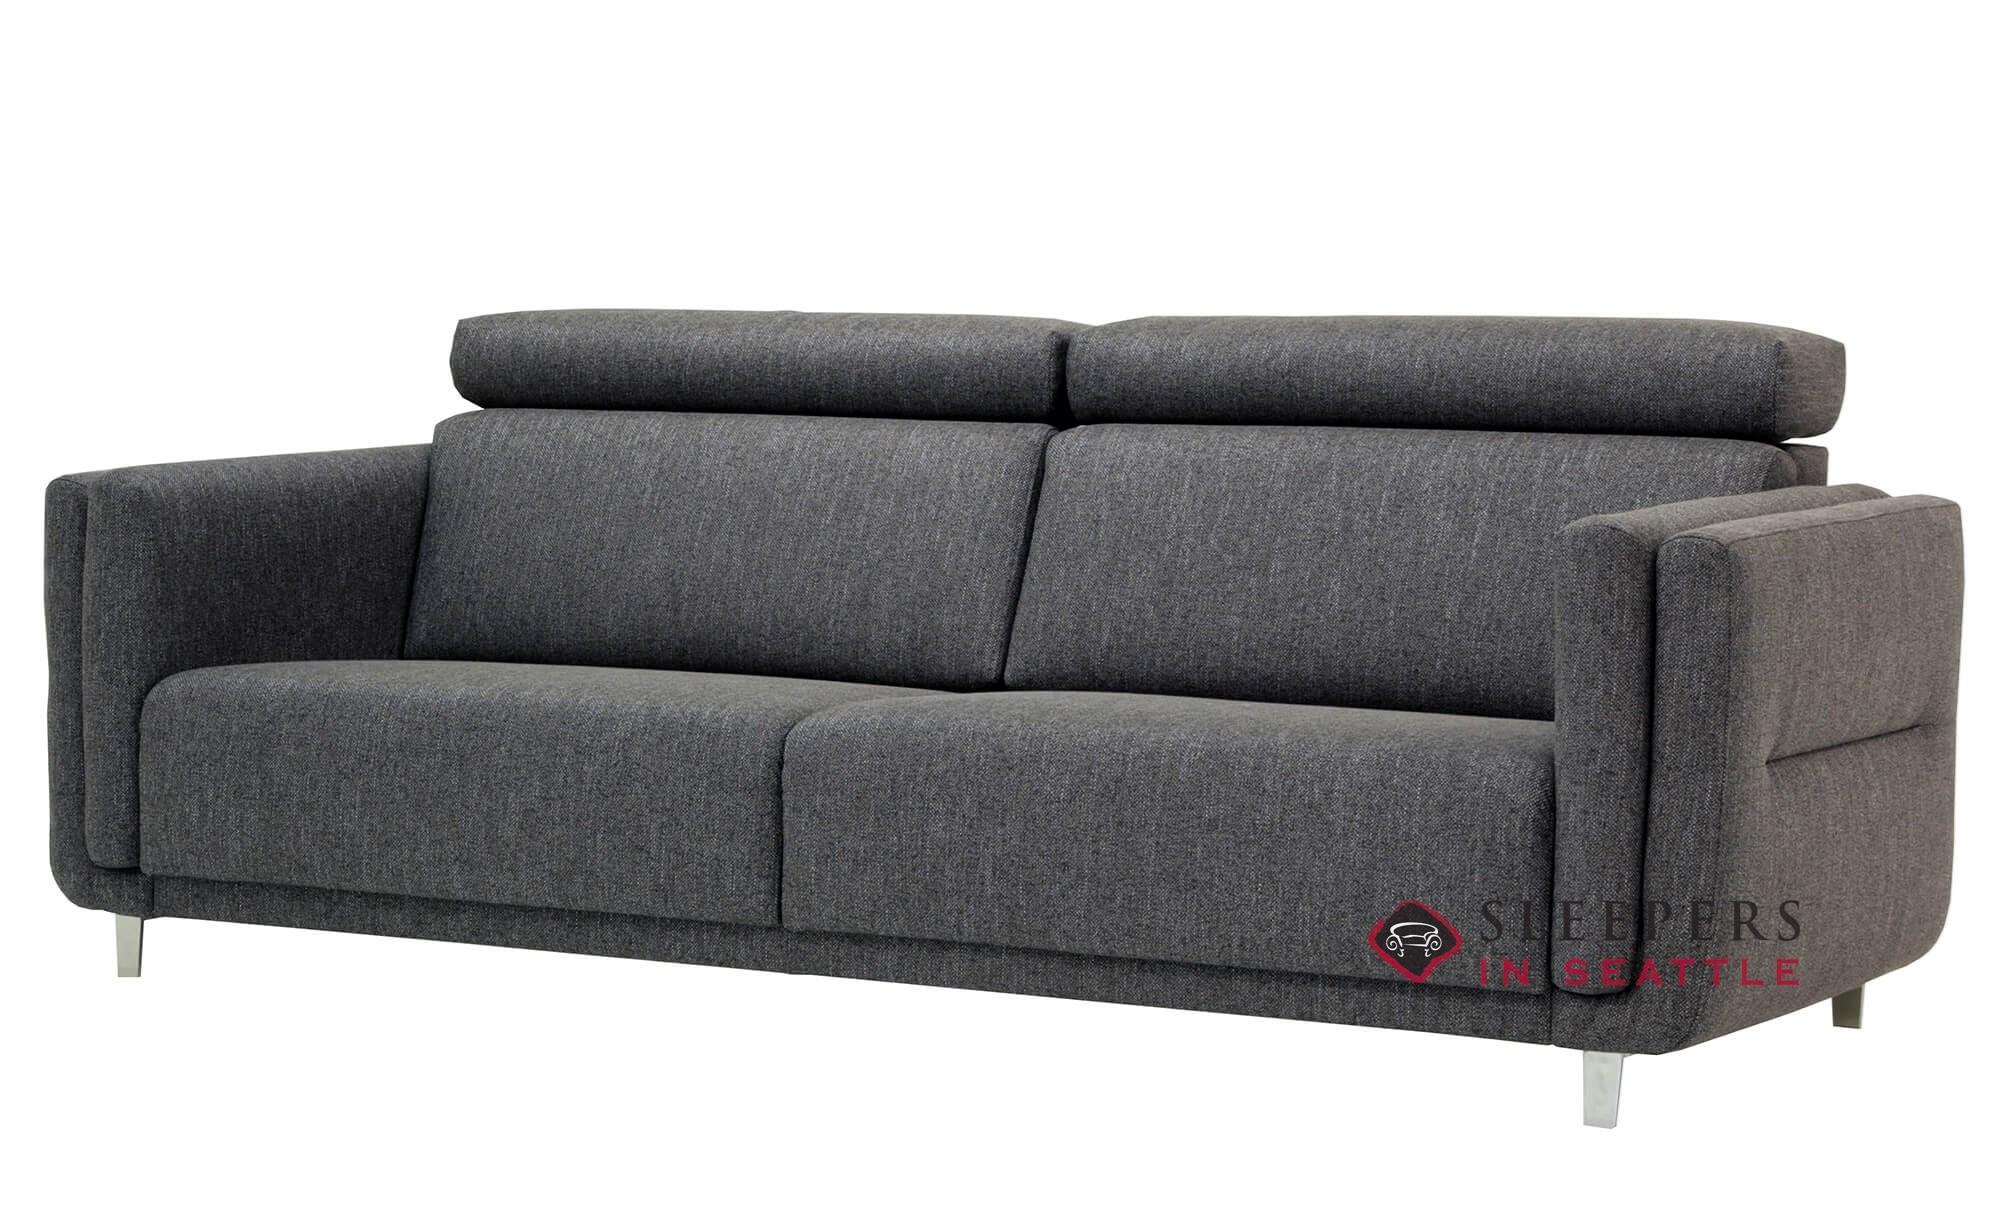 Sensational Luonto Paris King Sleeper Sofa Theyellowbook Wood Chair Design Ideas Theyellowbookinfo